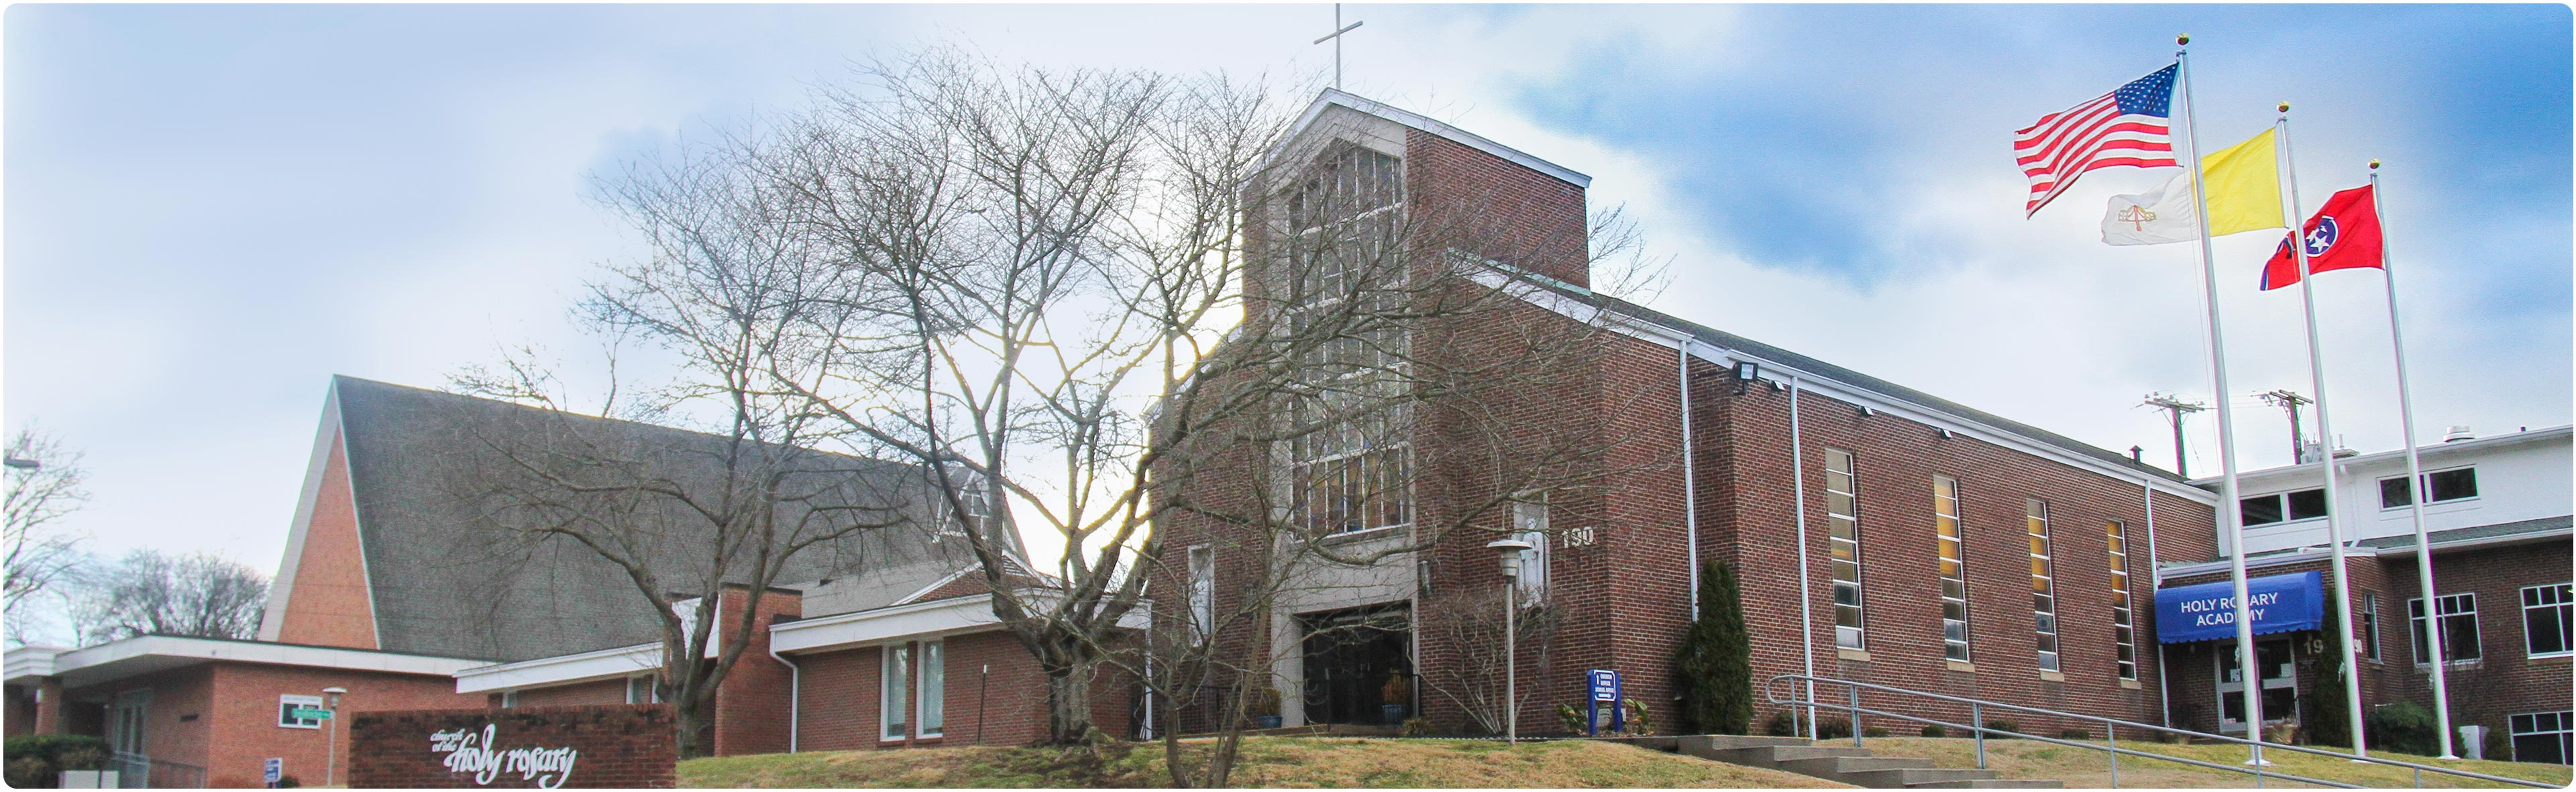 church_exterior_3840x1181